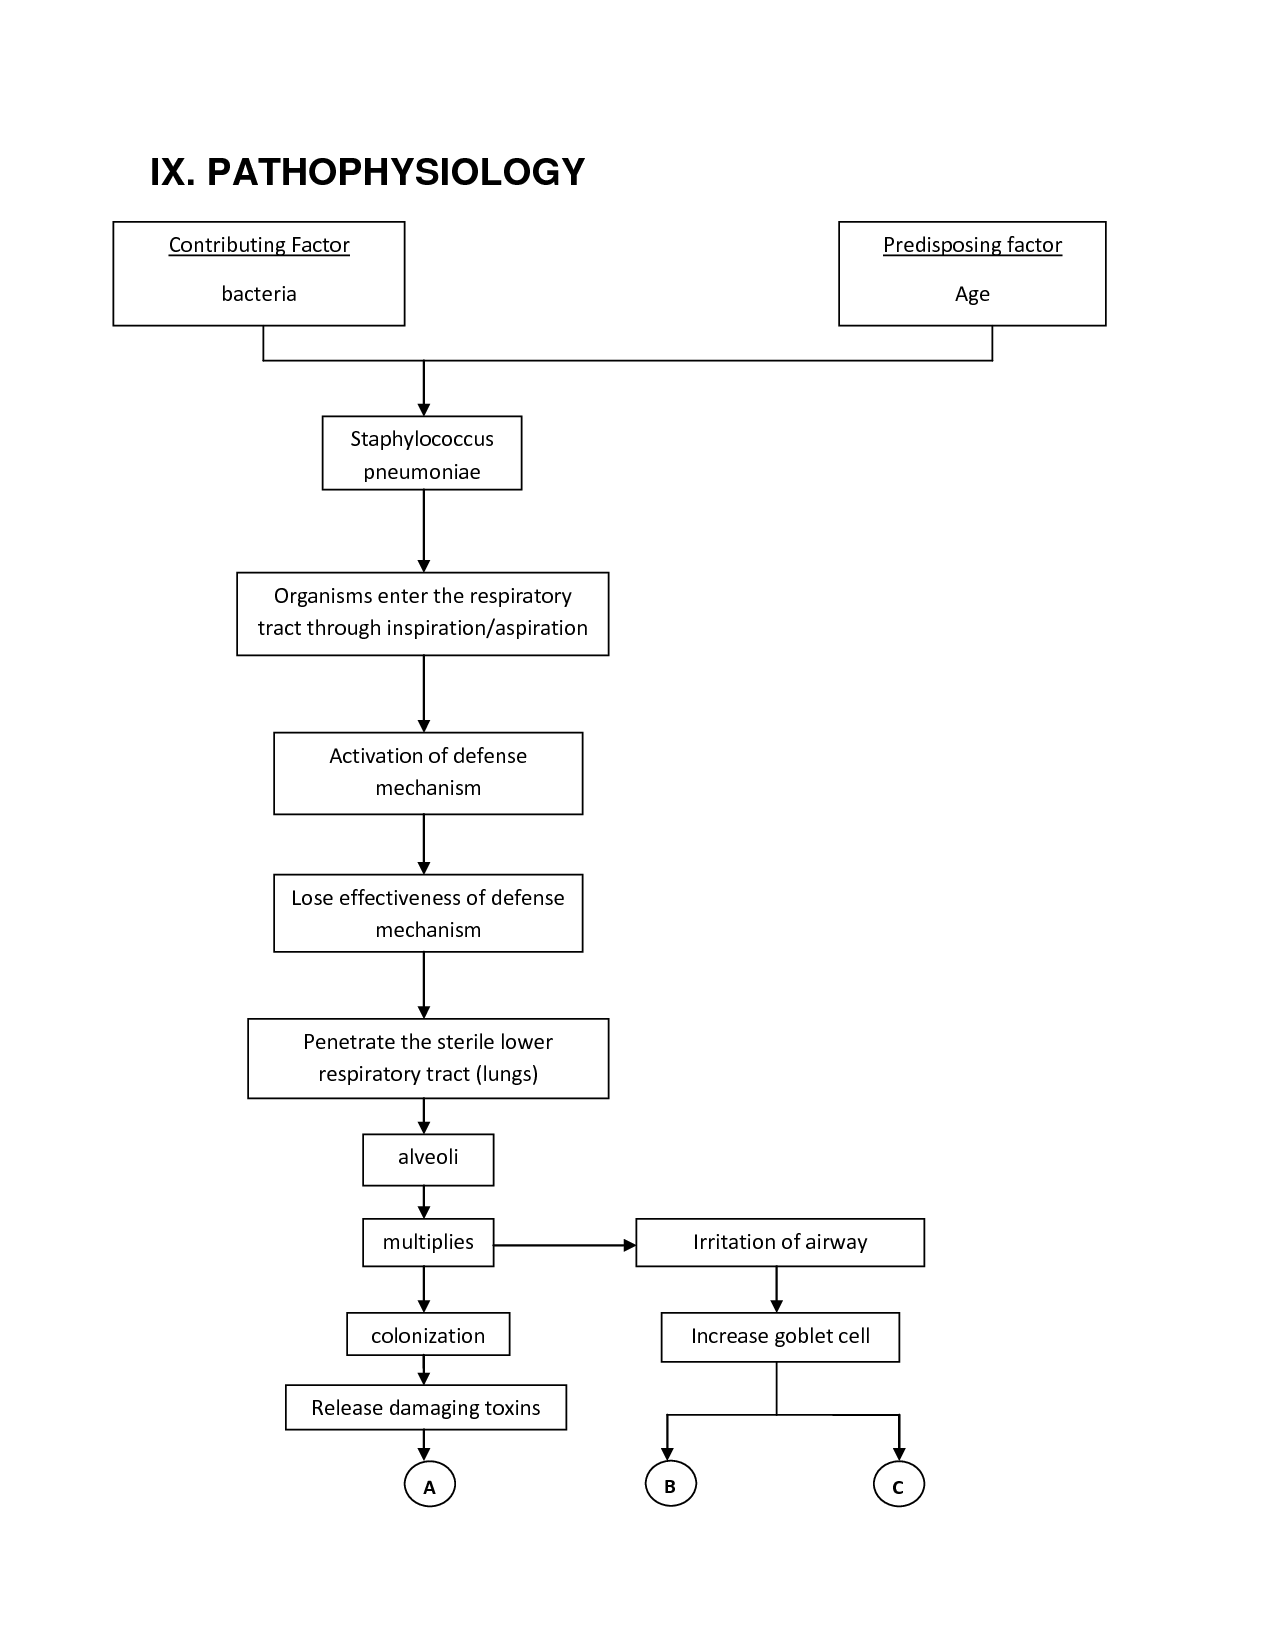 simple pneumonia diagram wiring diagrams wni pathophysiology charts pathophysiology of pneumonia nursing simple pneumonia diagram [ 1275 x 1650 Pixel ]